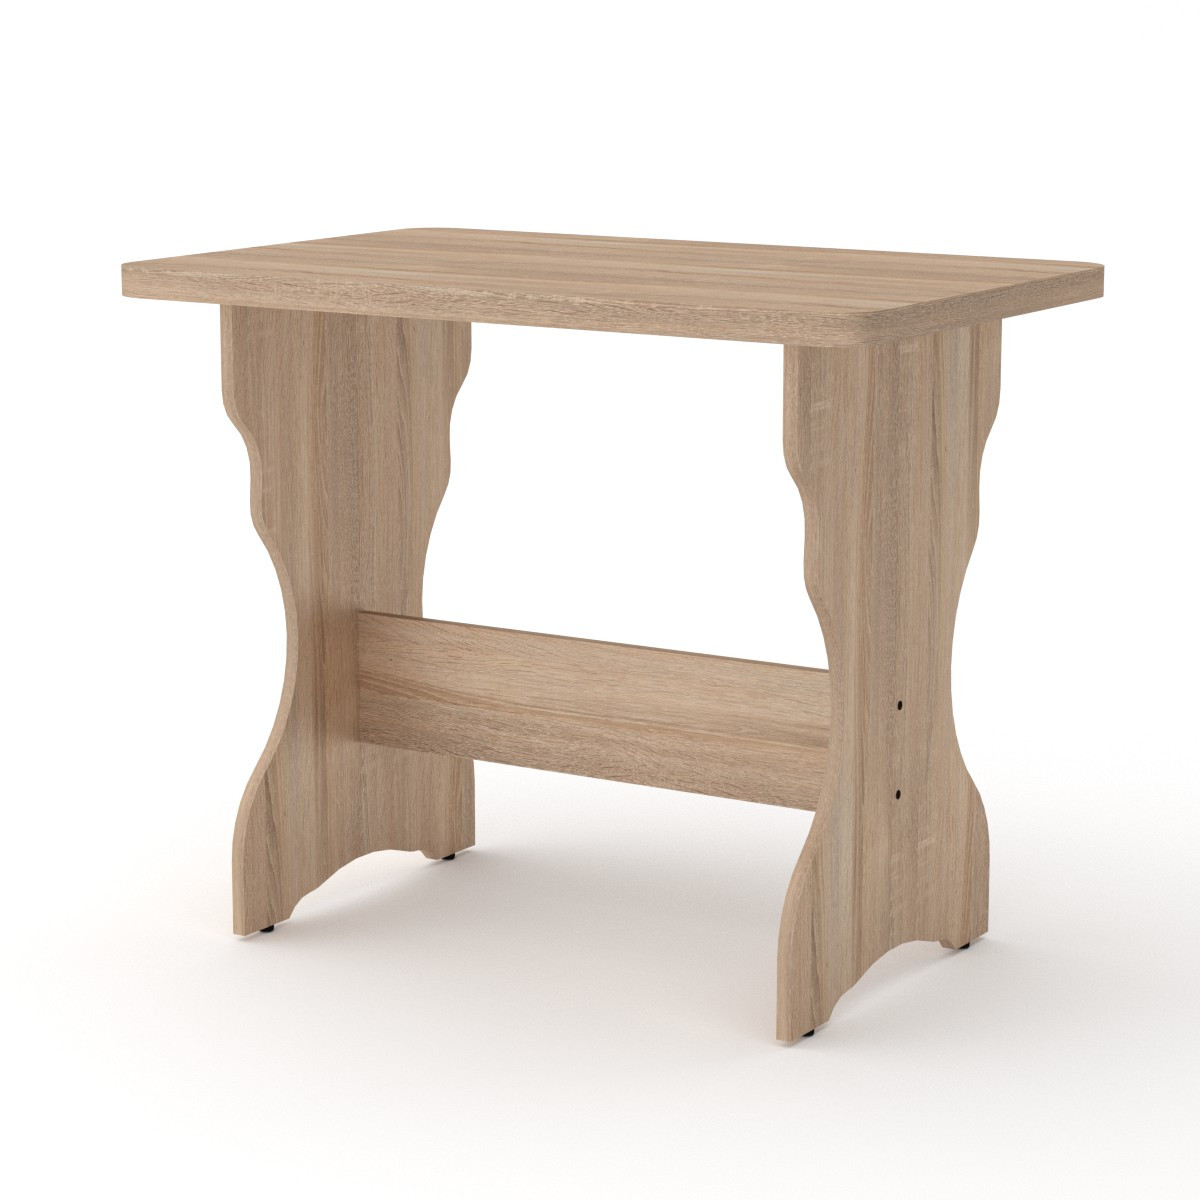 Стол кухонный КС-3 яблоня Компанит (90х59х73 см), фото 6